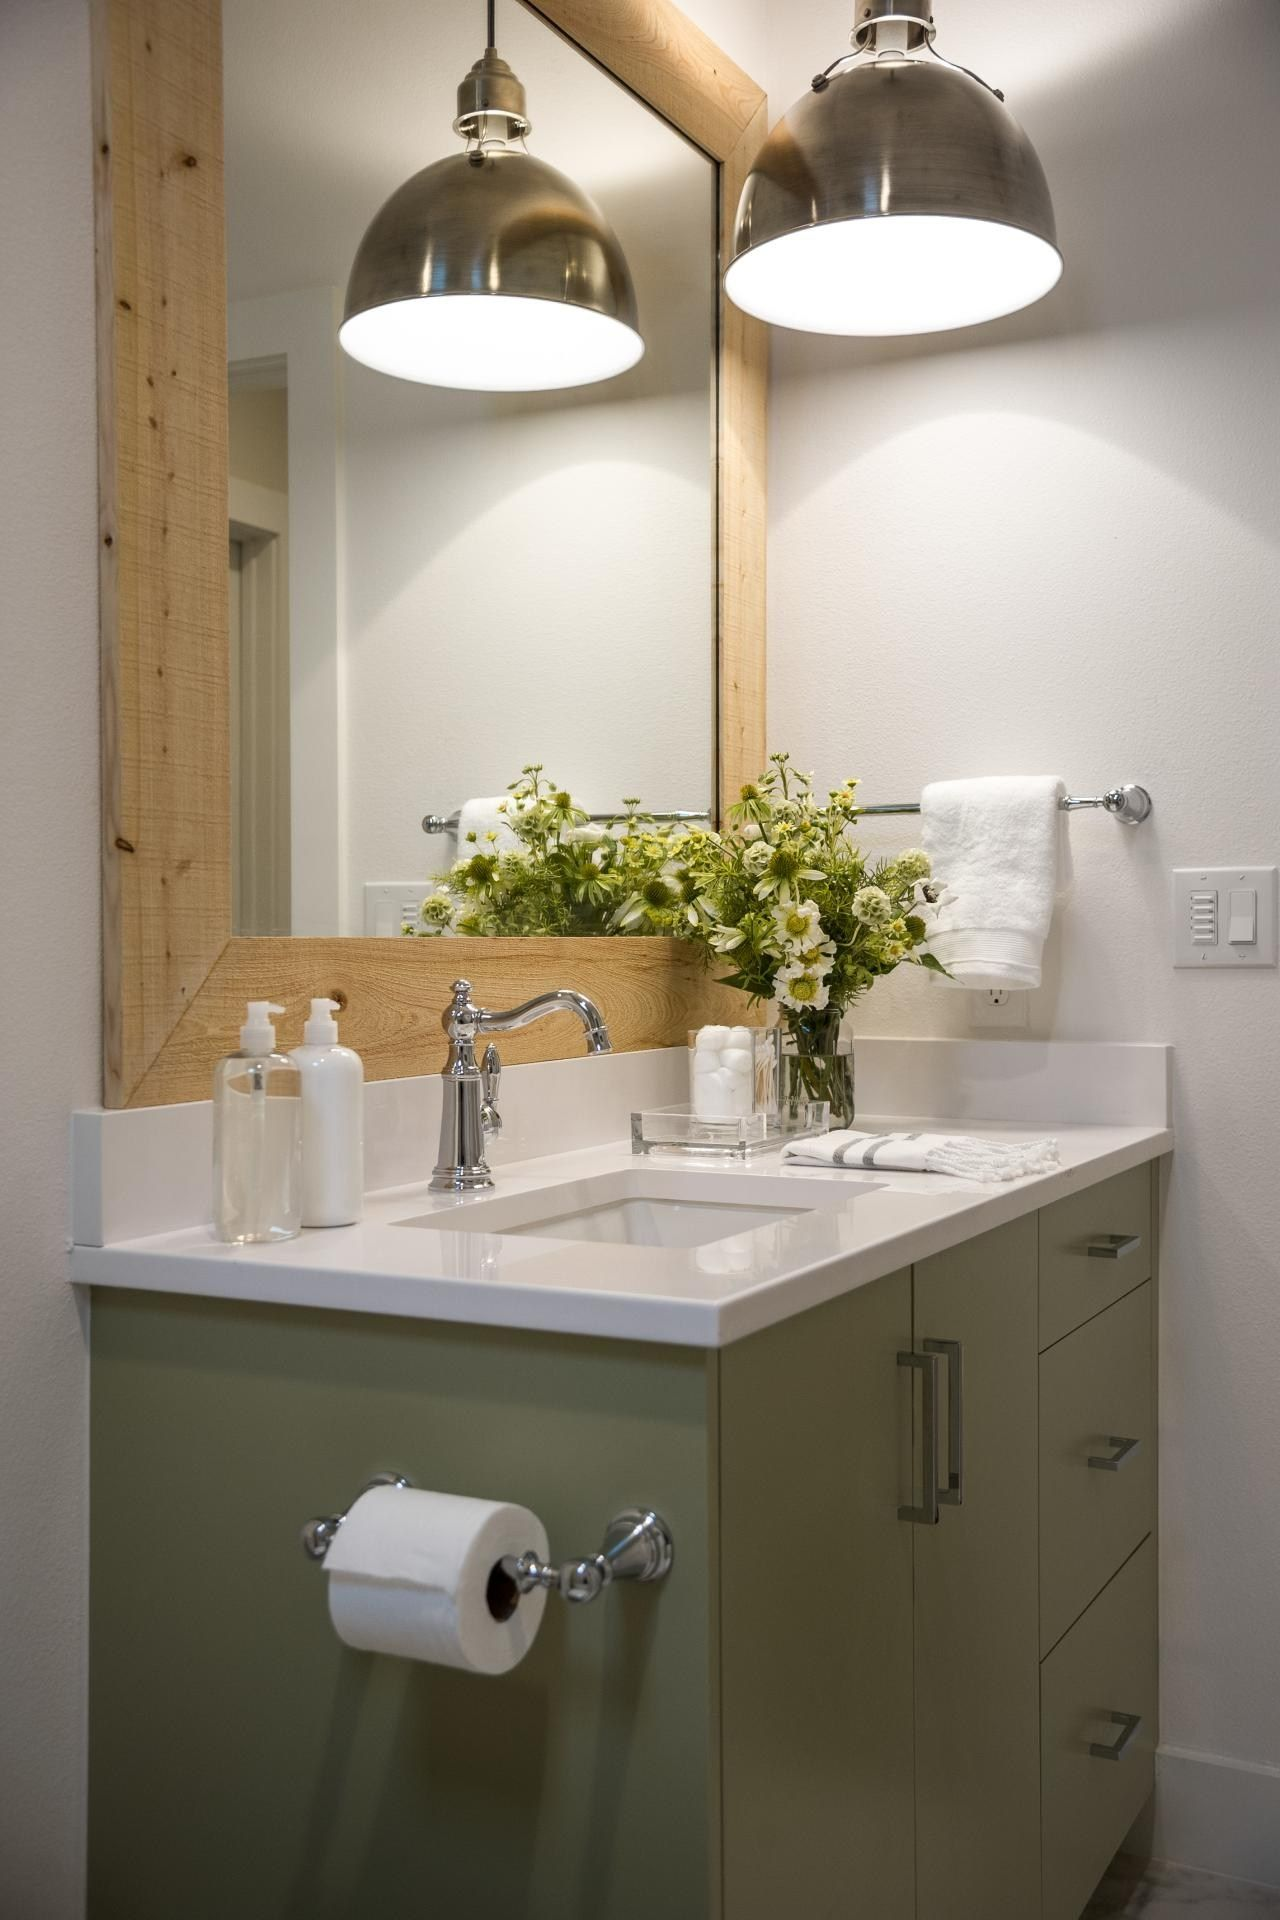 Interior Bathroom Vanity Lighting Ideas Modern Bathroom Vanity Lighting Light Fixtures Bathroom Vanity Elegant Bathroom